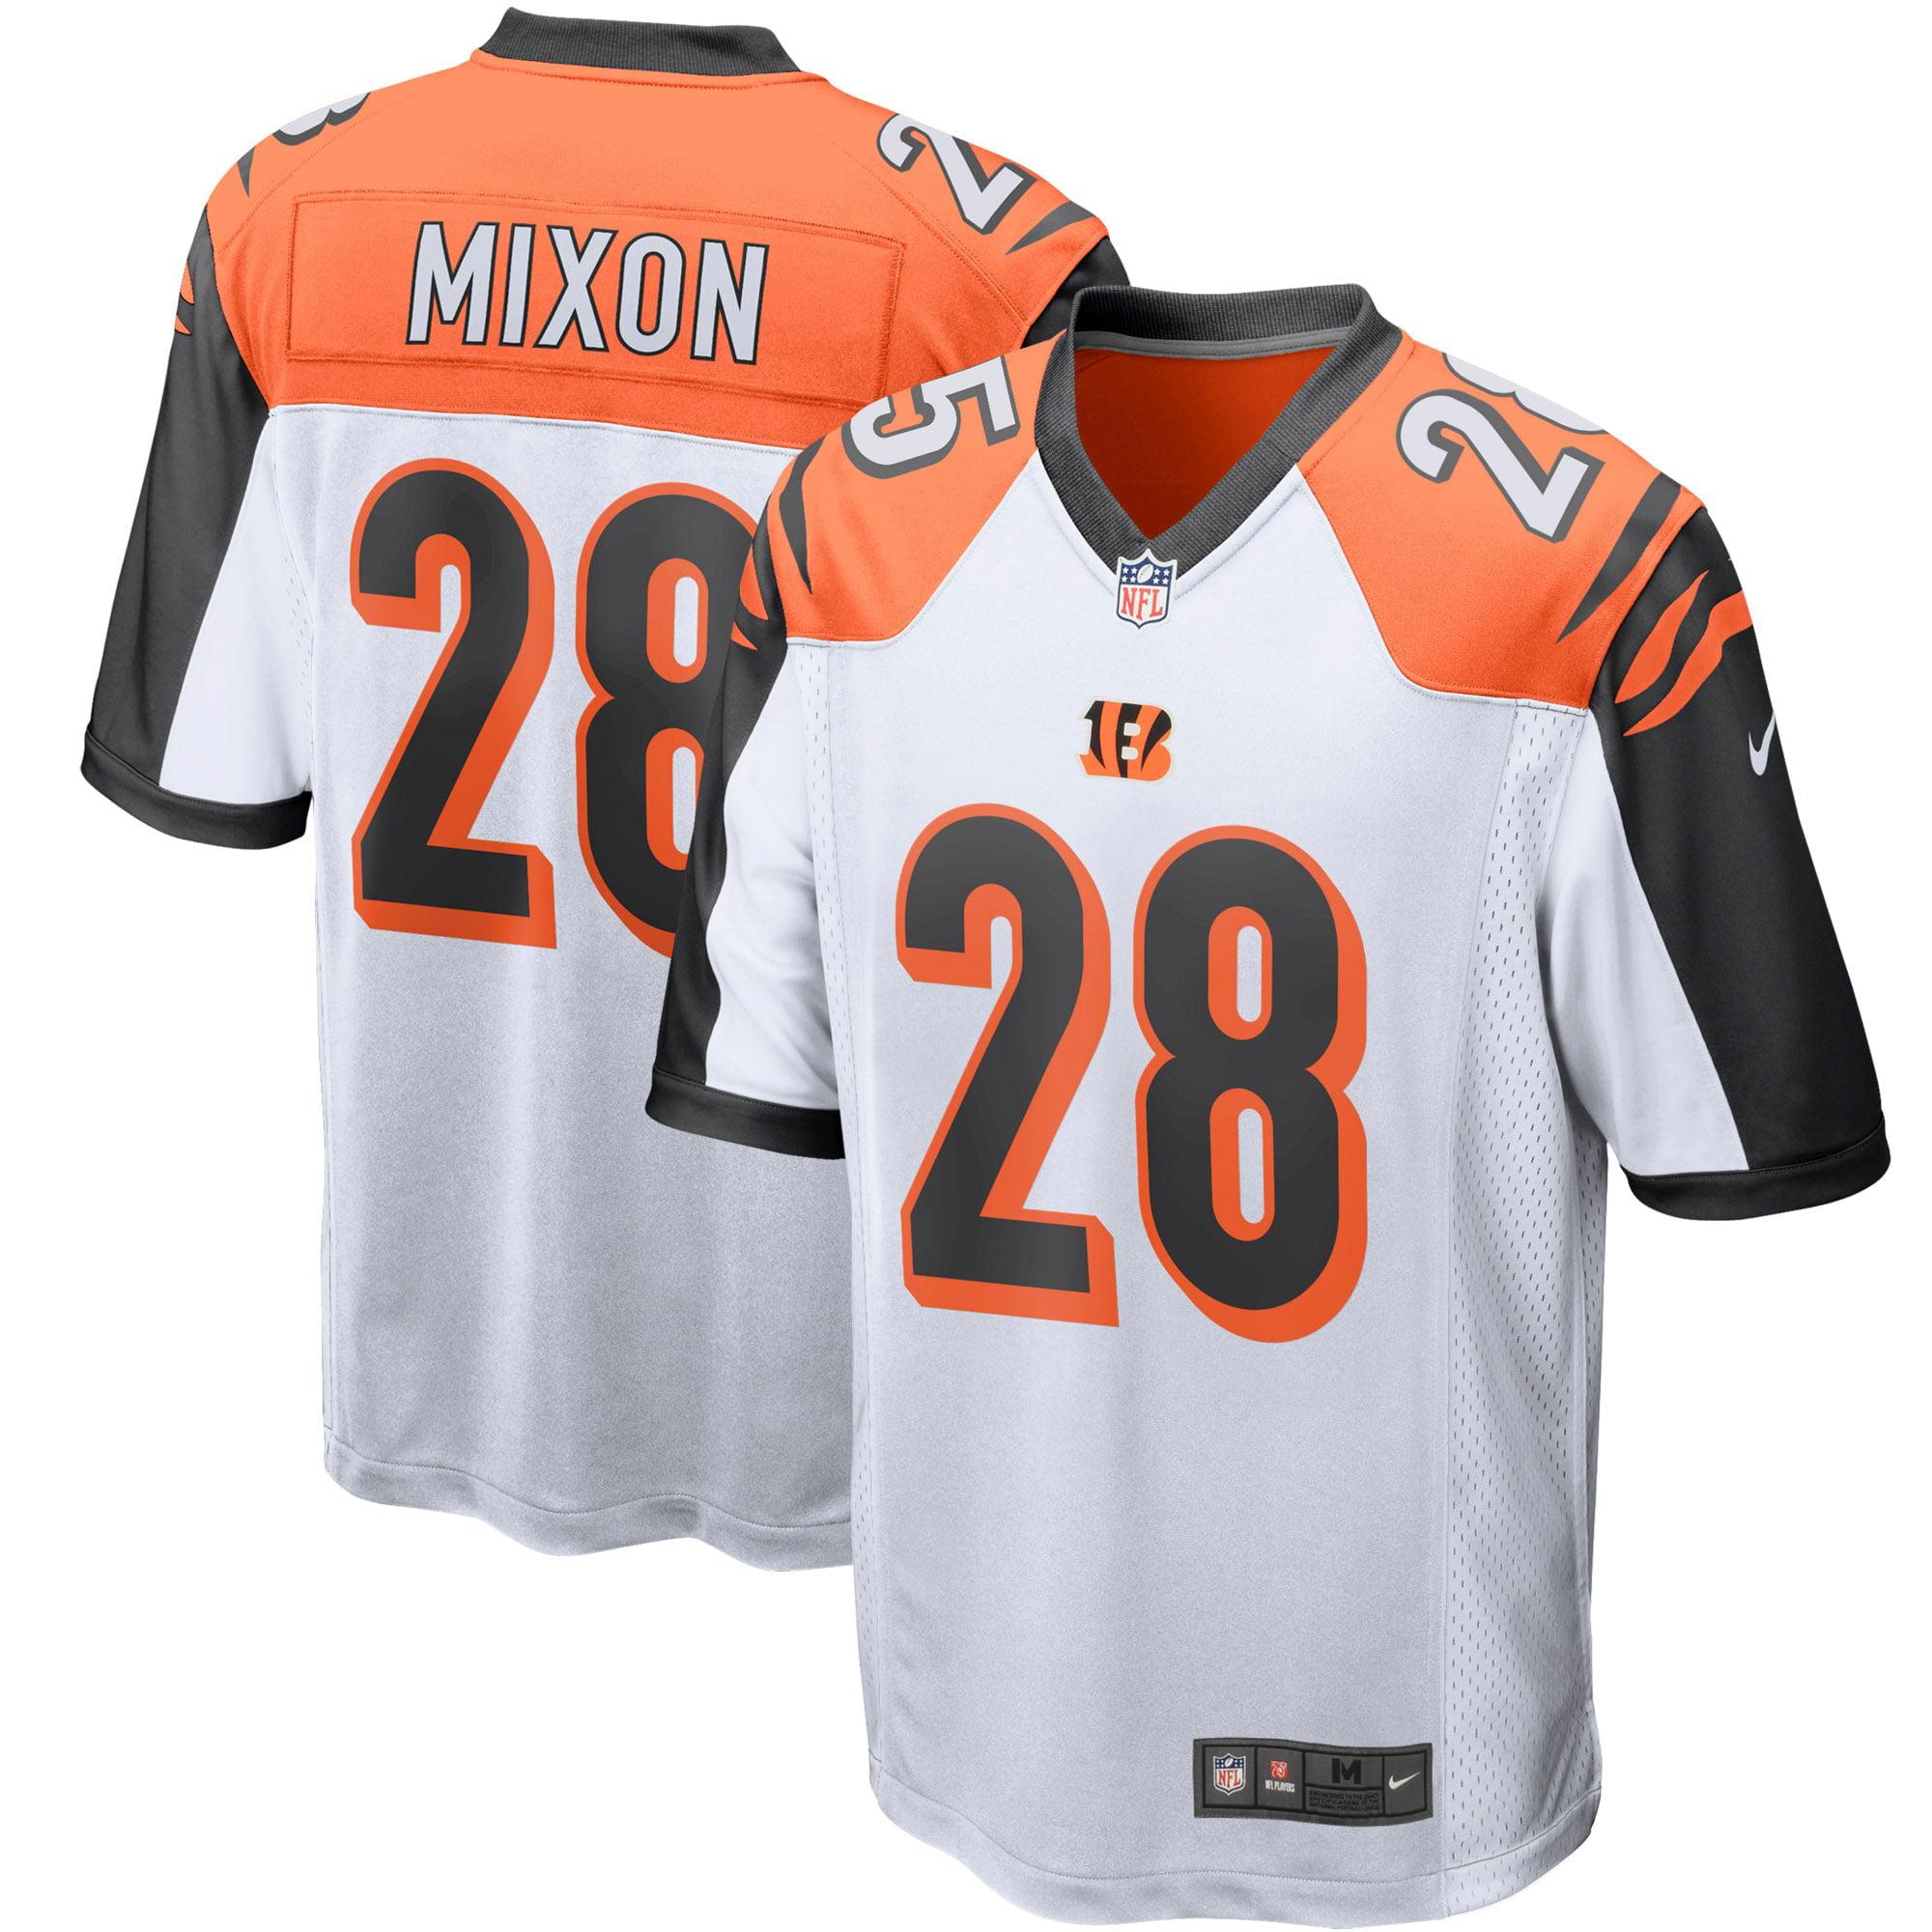 Joe Mixon Cincinnati Bengals Nike Player Game Jersey - White - Walmart.com